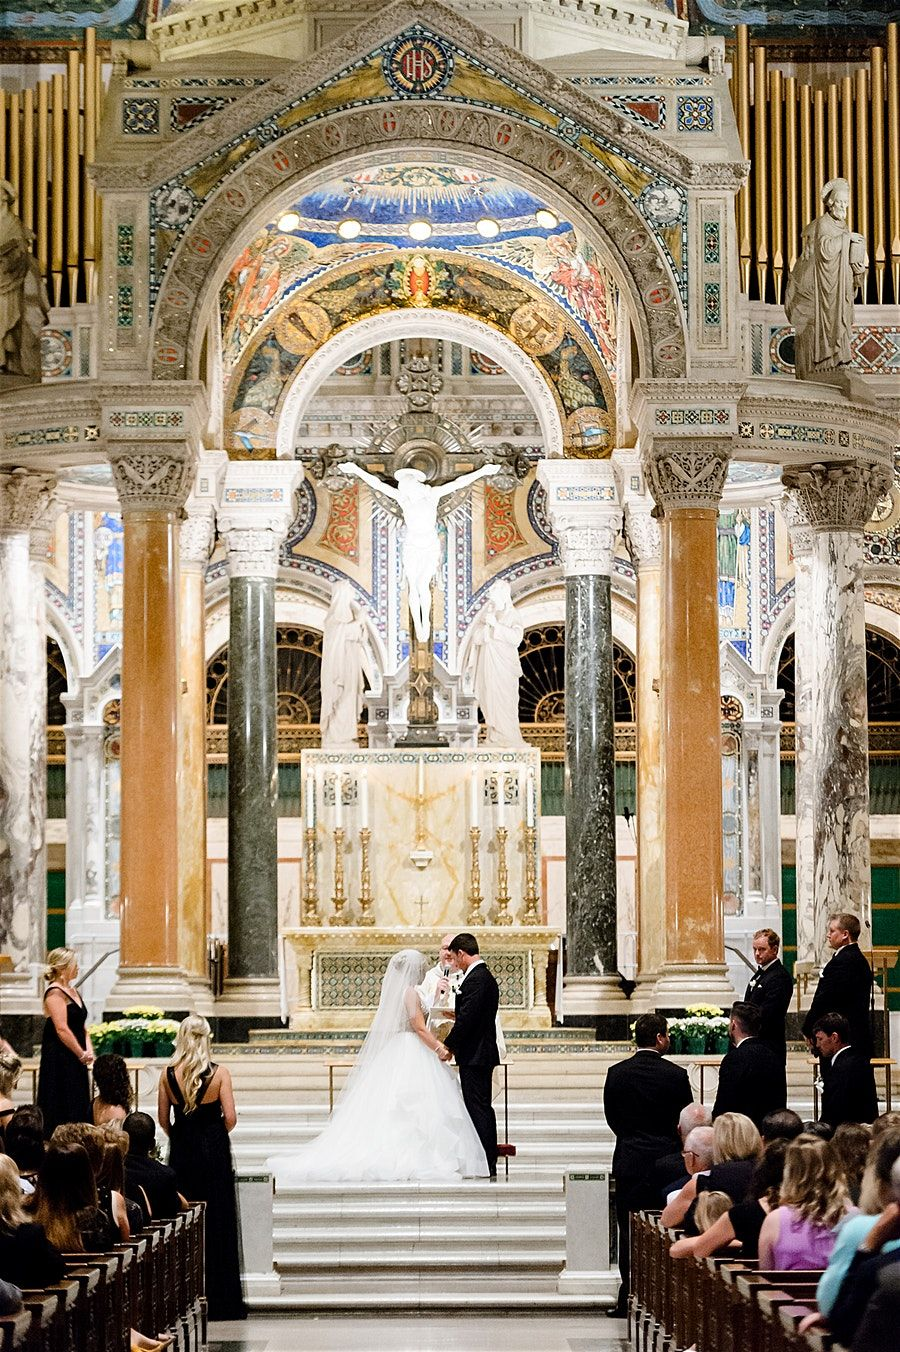 Wedding Photos By Saint Louis Wedding Photographer Ashley Fisher Photography Wedding Ceremony At The Cathedral B St Louis Wedding Cathedral Basilica St Louis